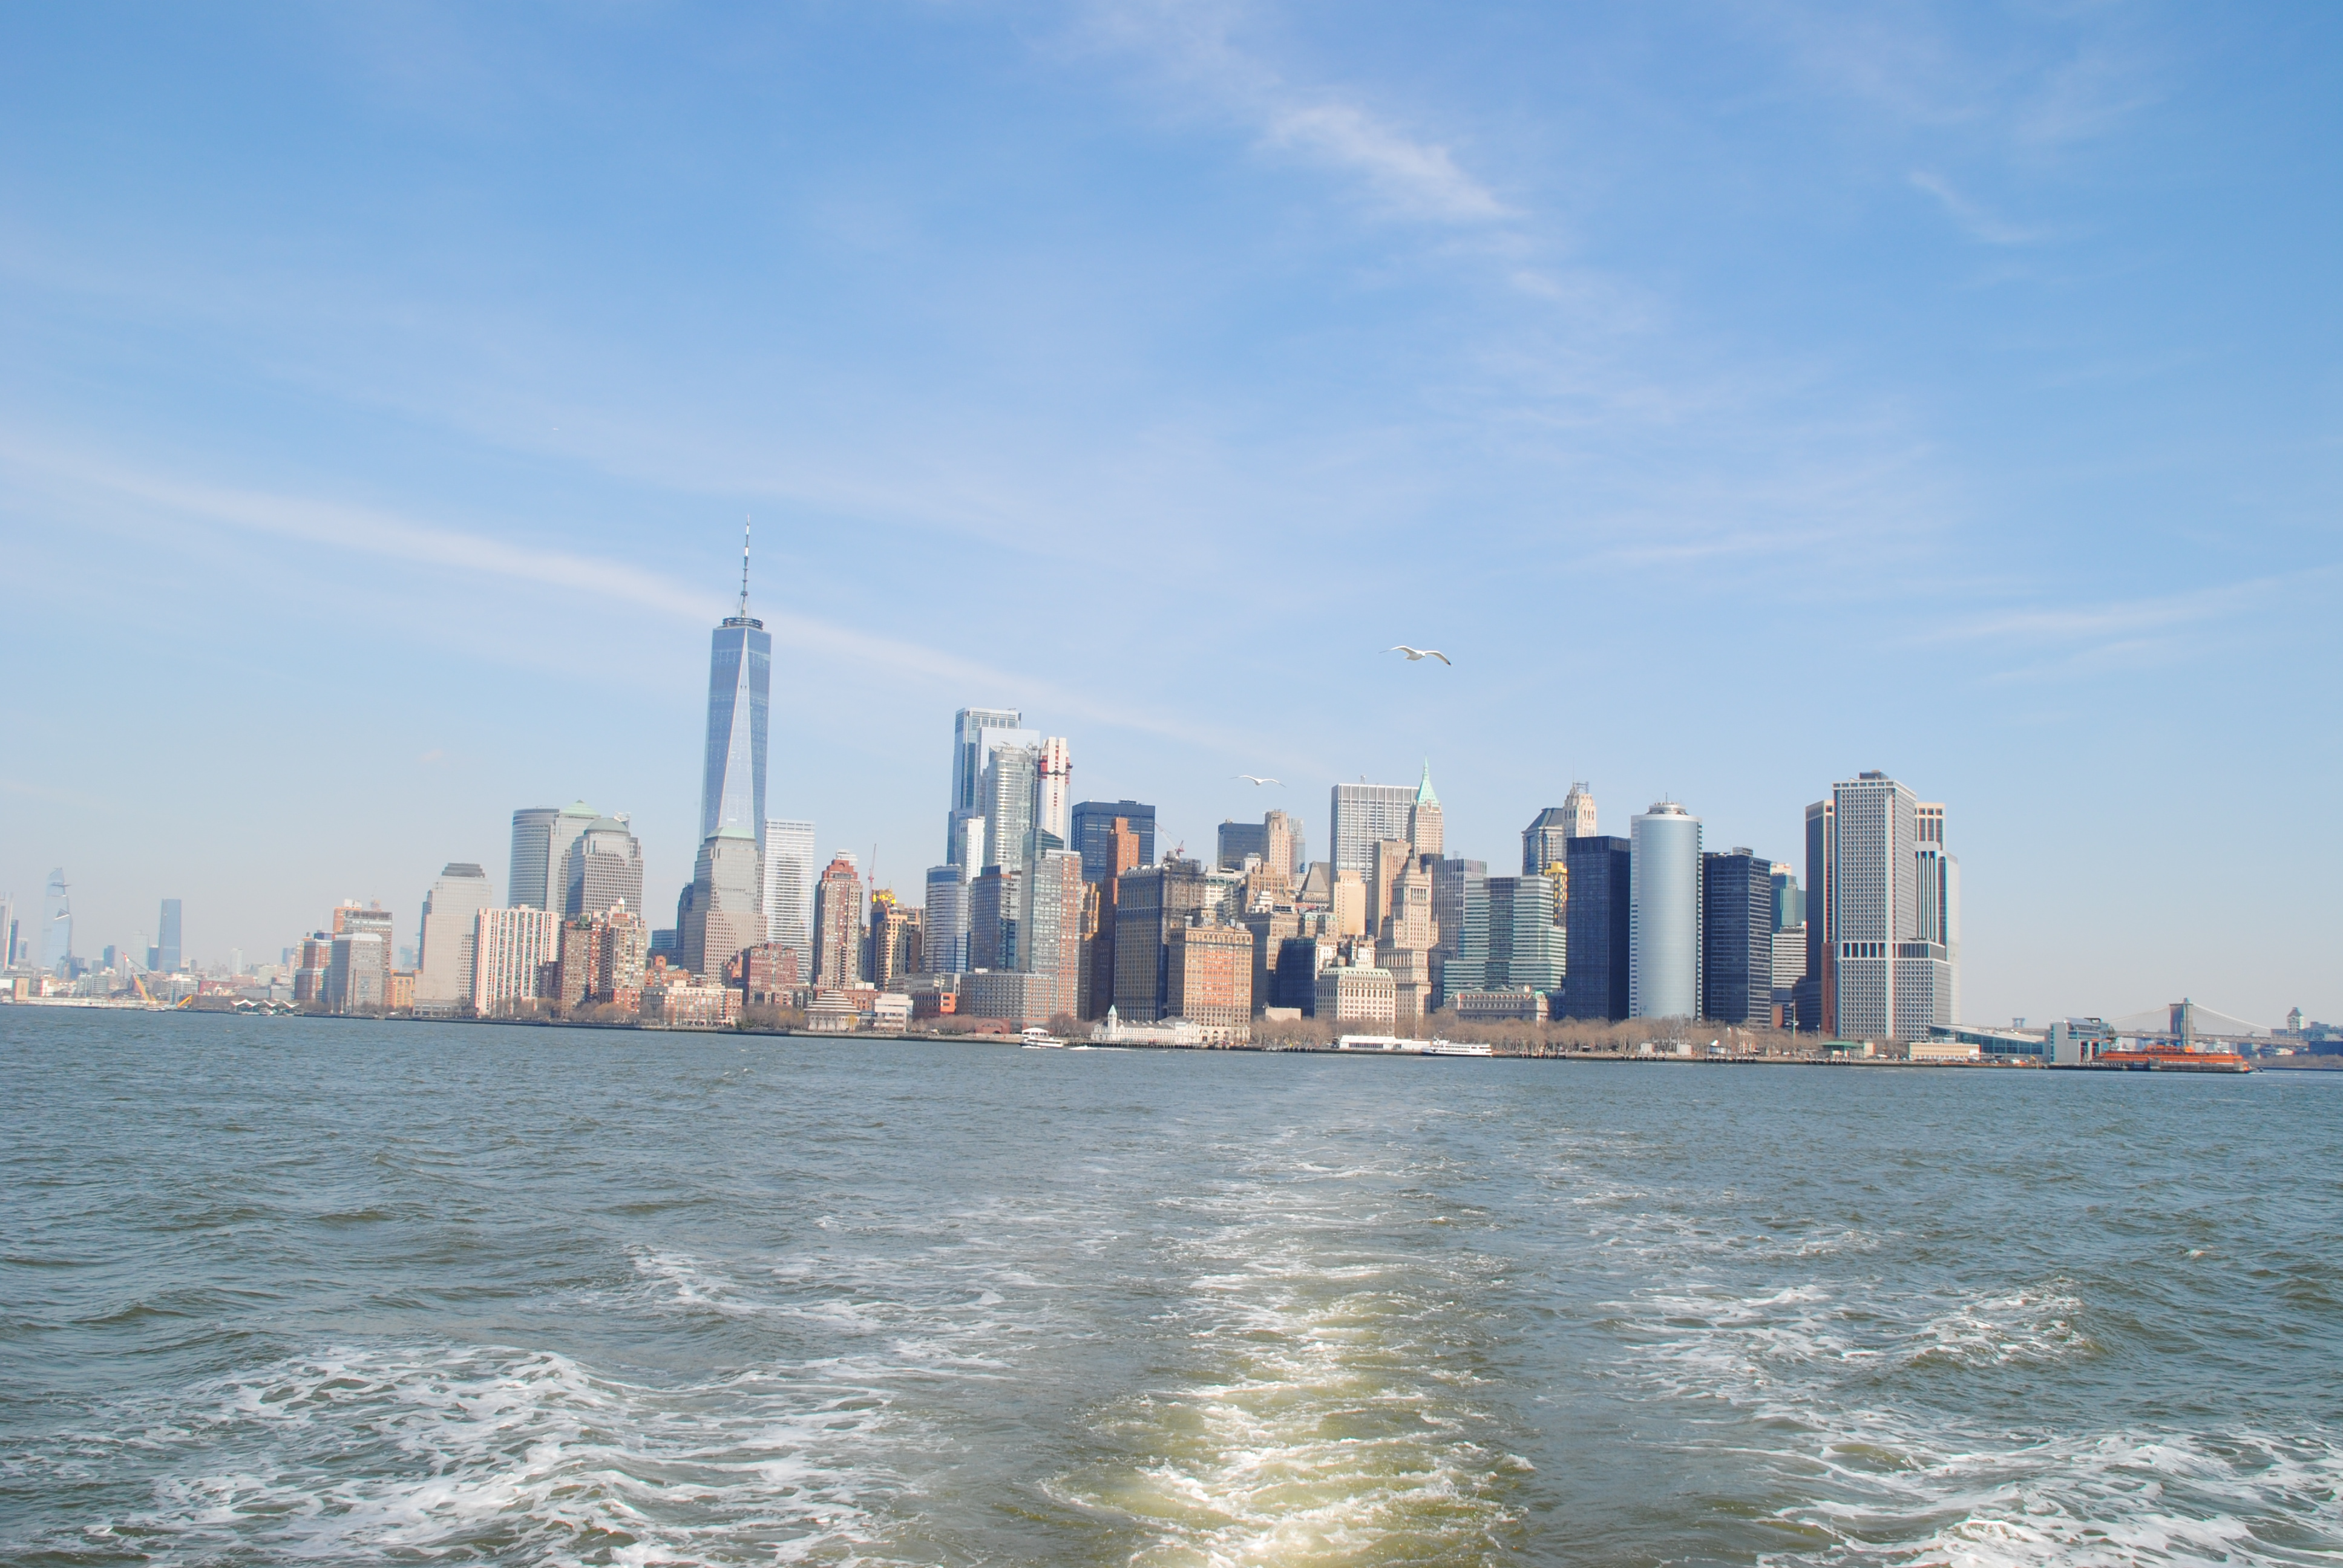 meilleurs sites de rencontres New York City application de rencontres oilr